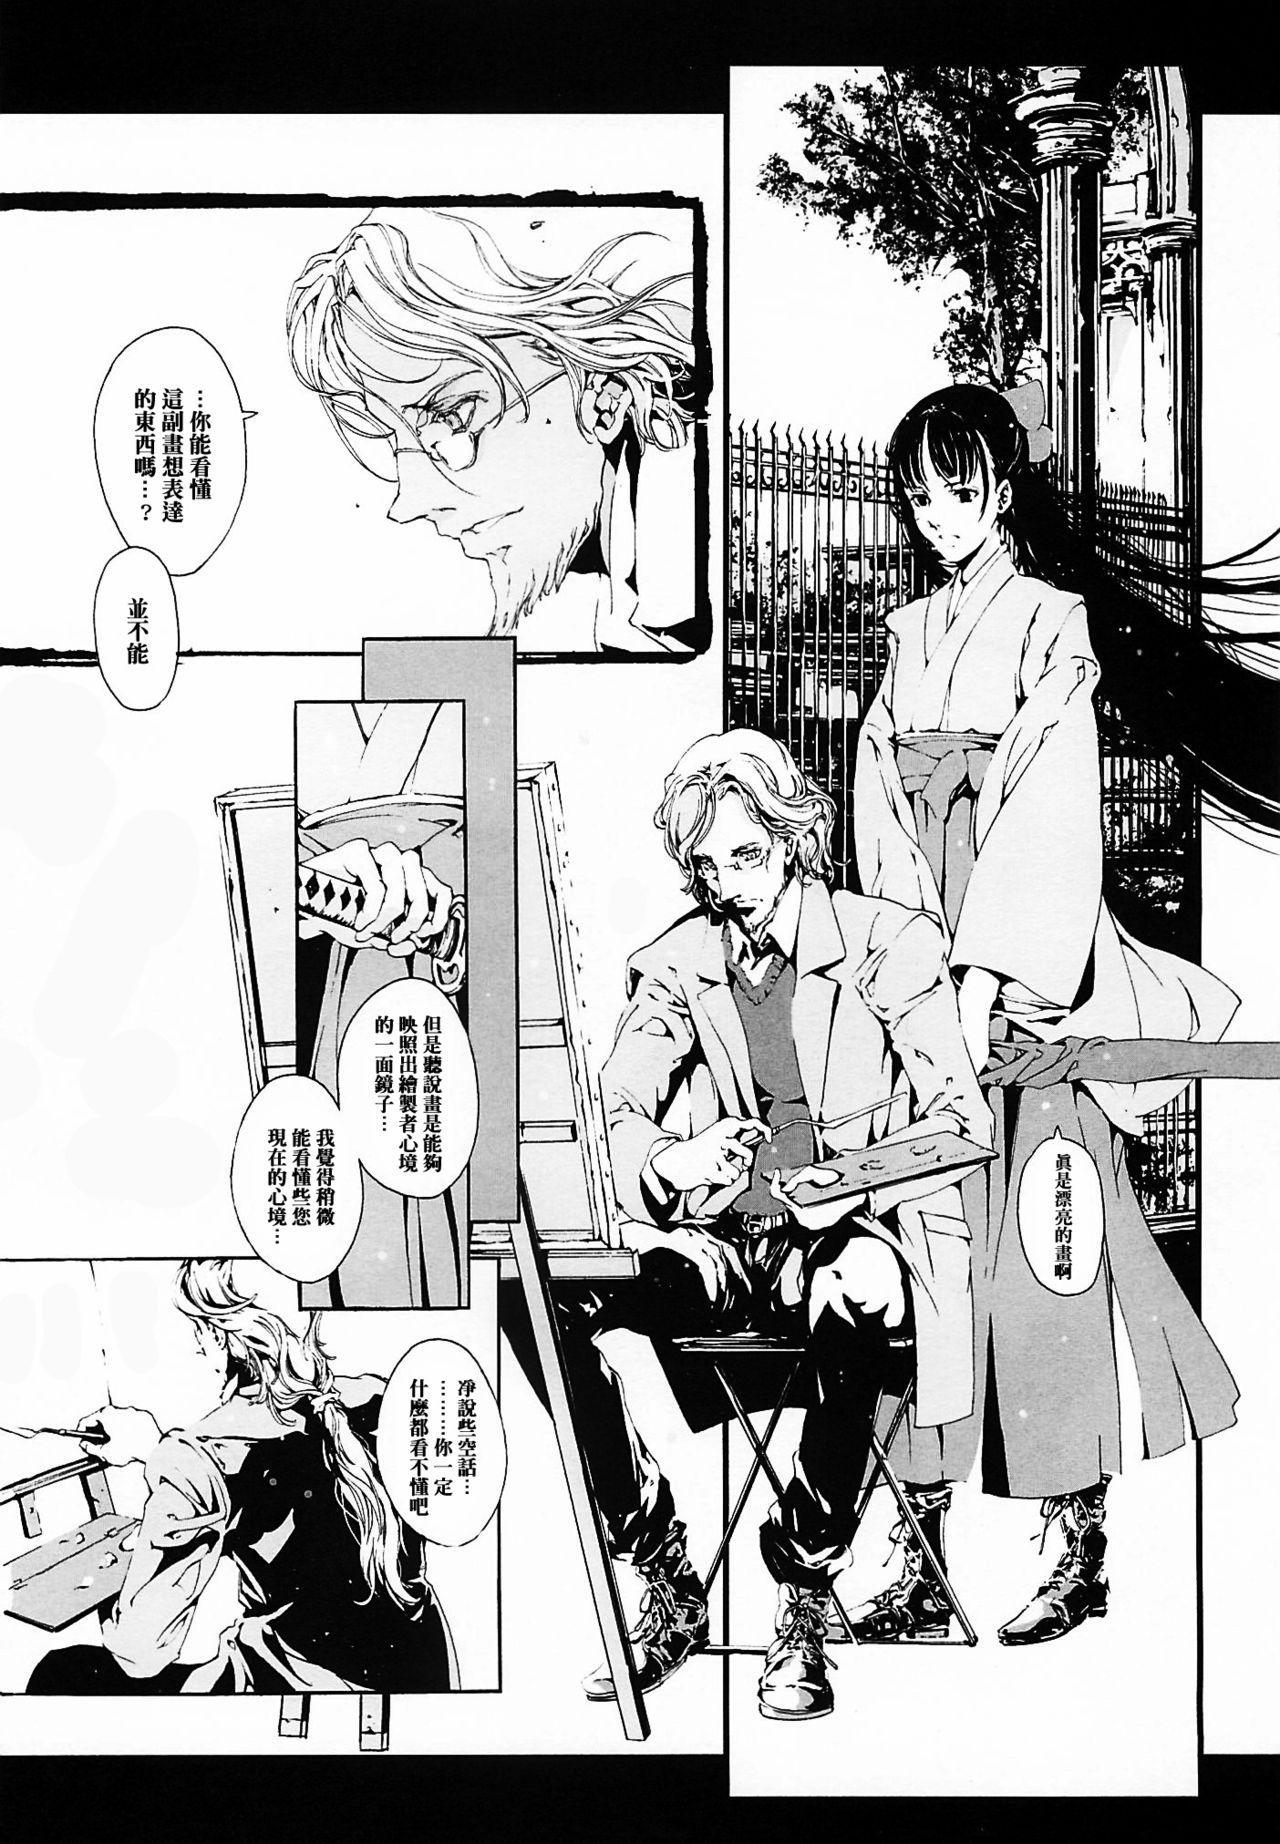 (CR37) [70 Nenshiki Yuukyuu Kikan (Endou Okito)] ORGAN-Tino  01-02[Chinese] [拾荒者汉化组] [Incomplete] 13